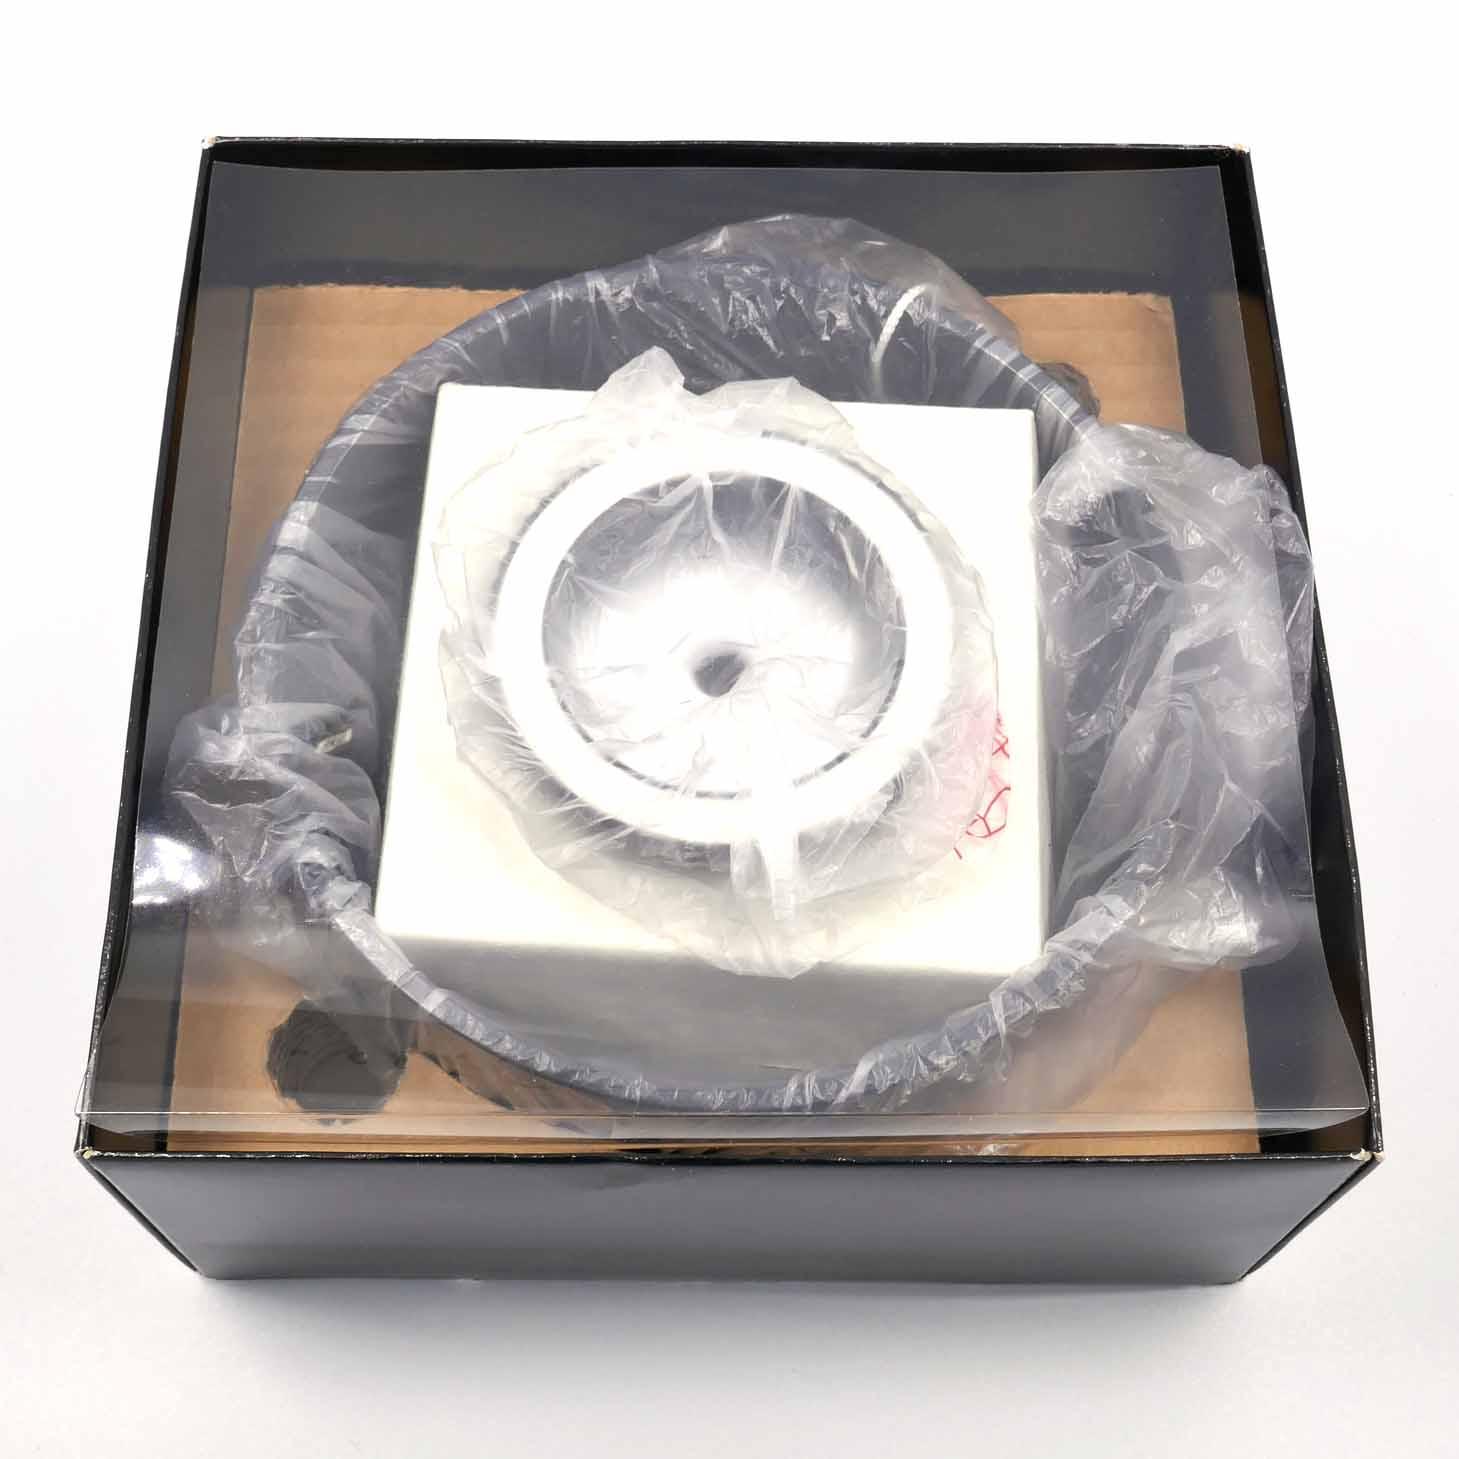 clean-cameras-Hasselblad-Mirror-Unit-40185-02